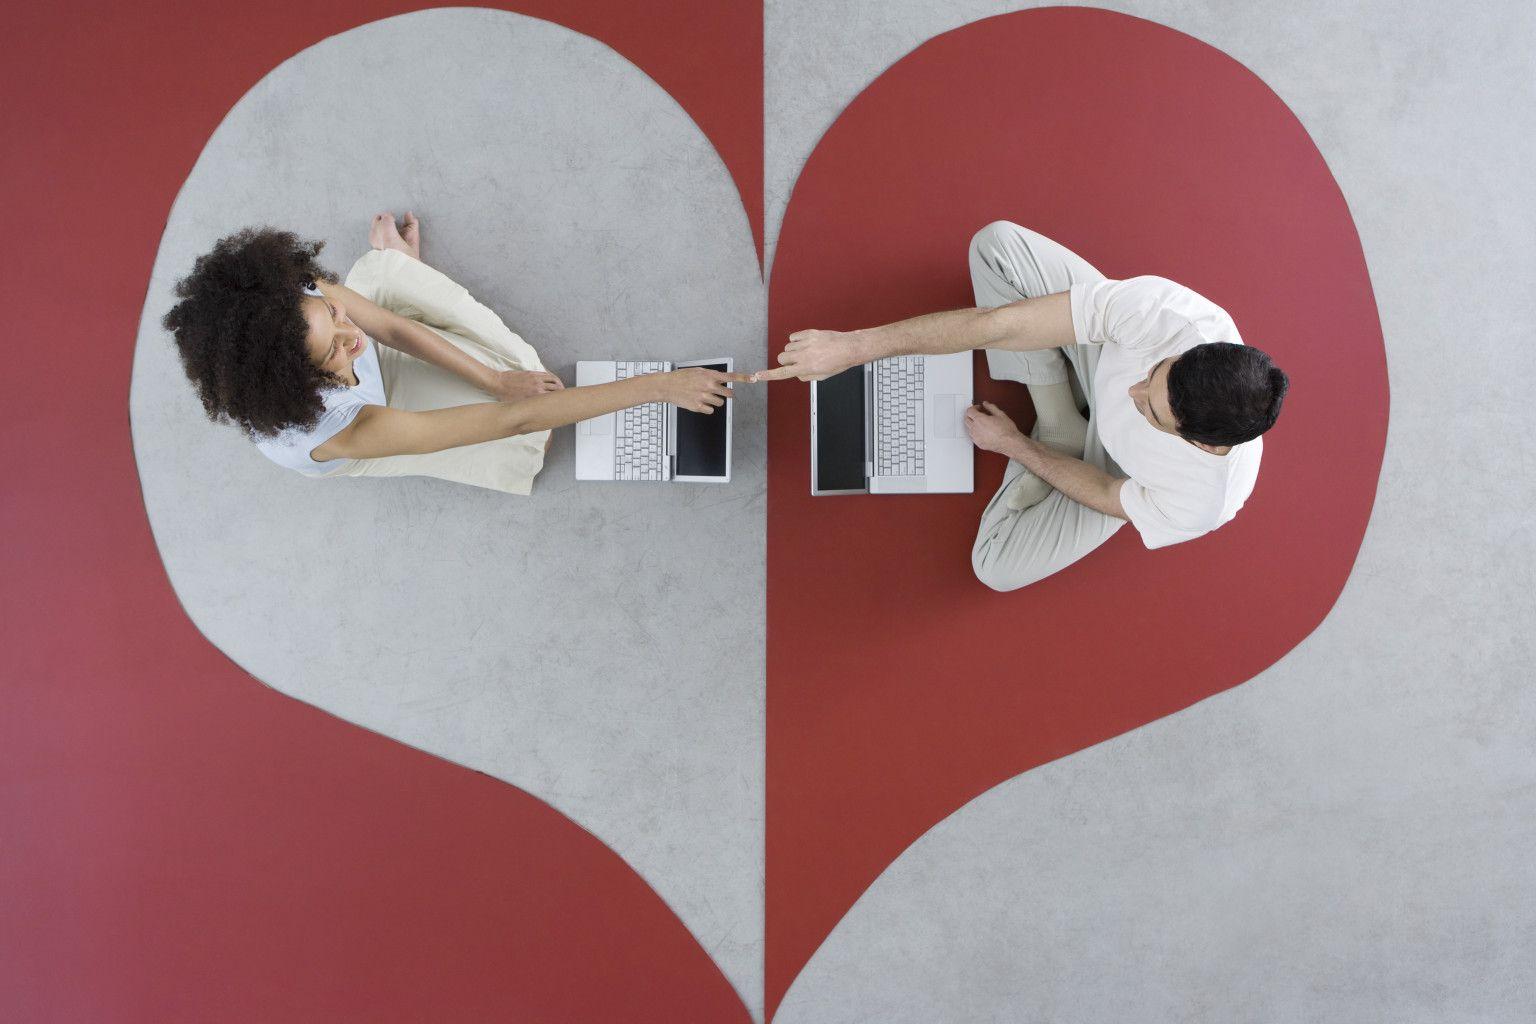 laws regarding online dating